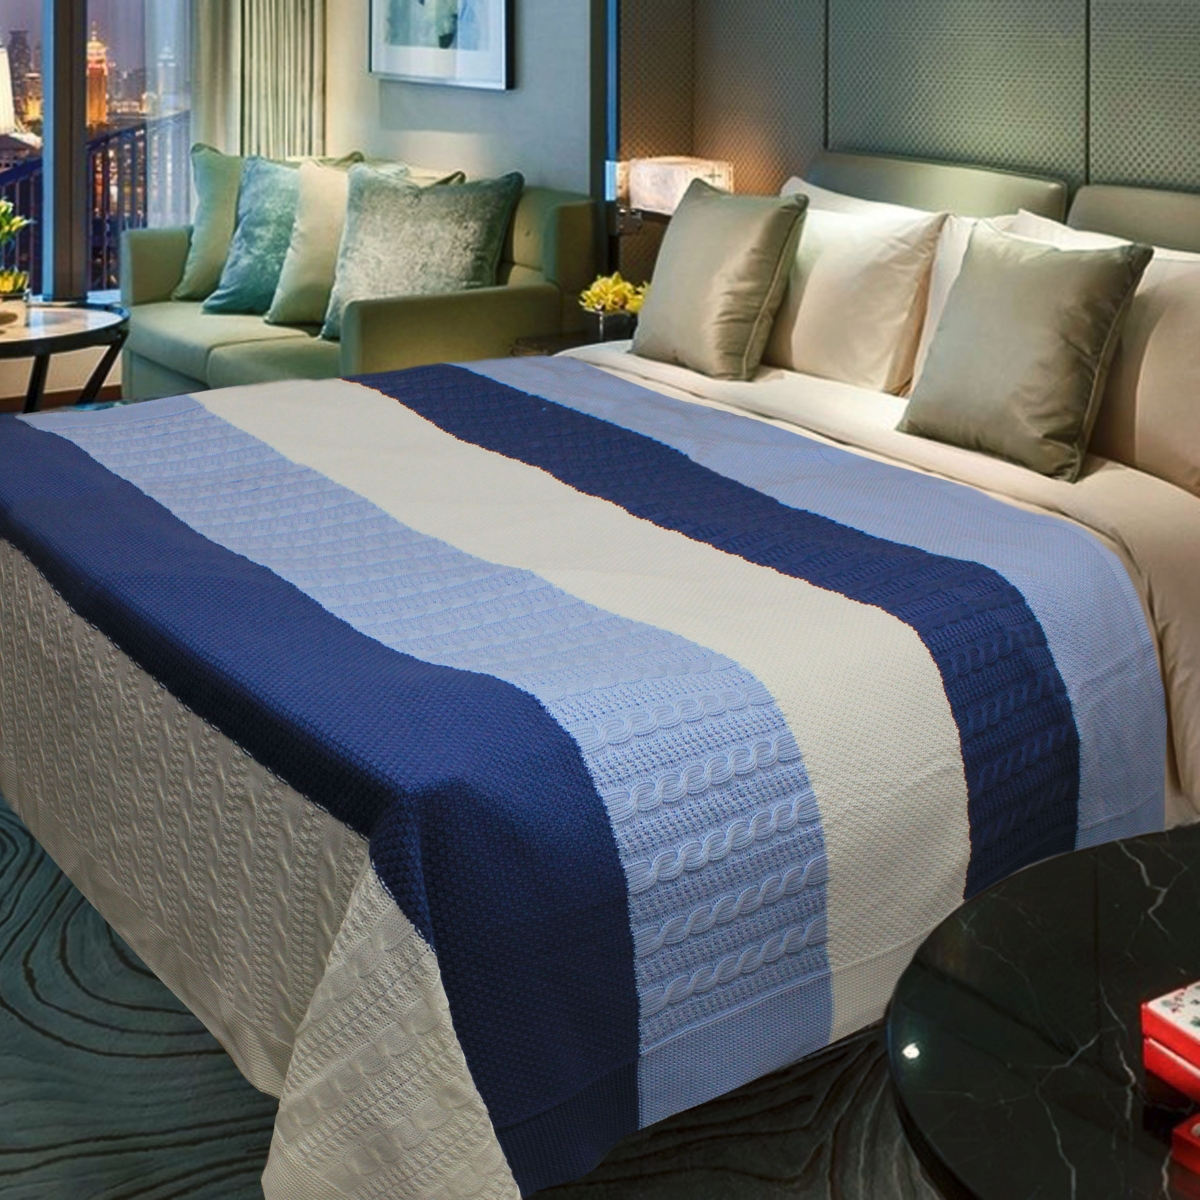 "Плед Buenas Noches ""Cotton"", цвет: белый, голубой, синий, 180 см х 210 см"